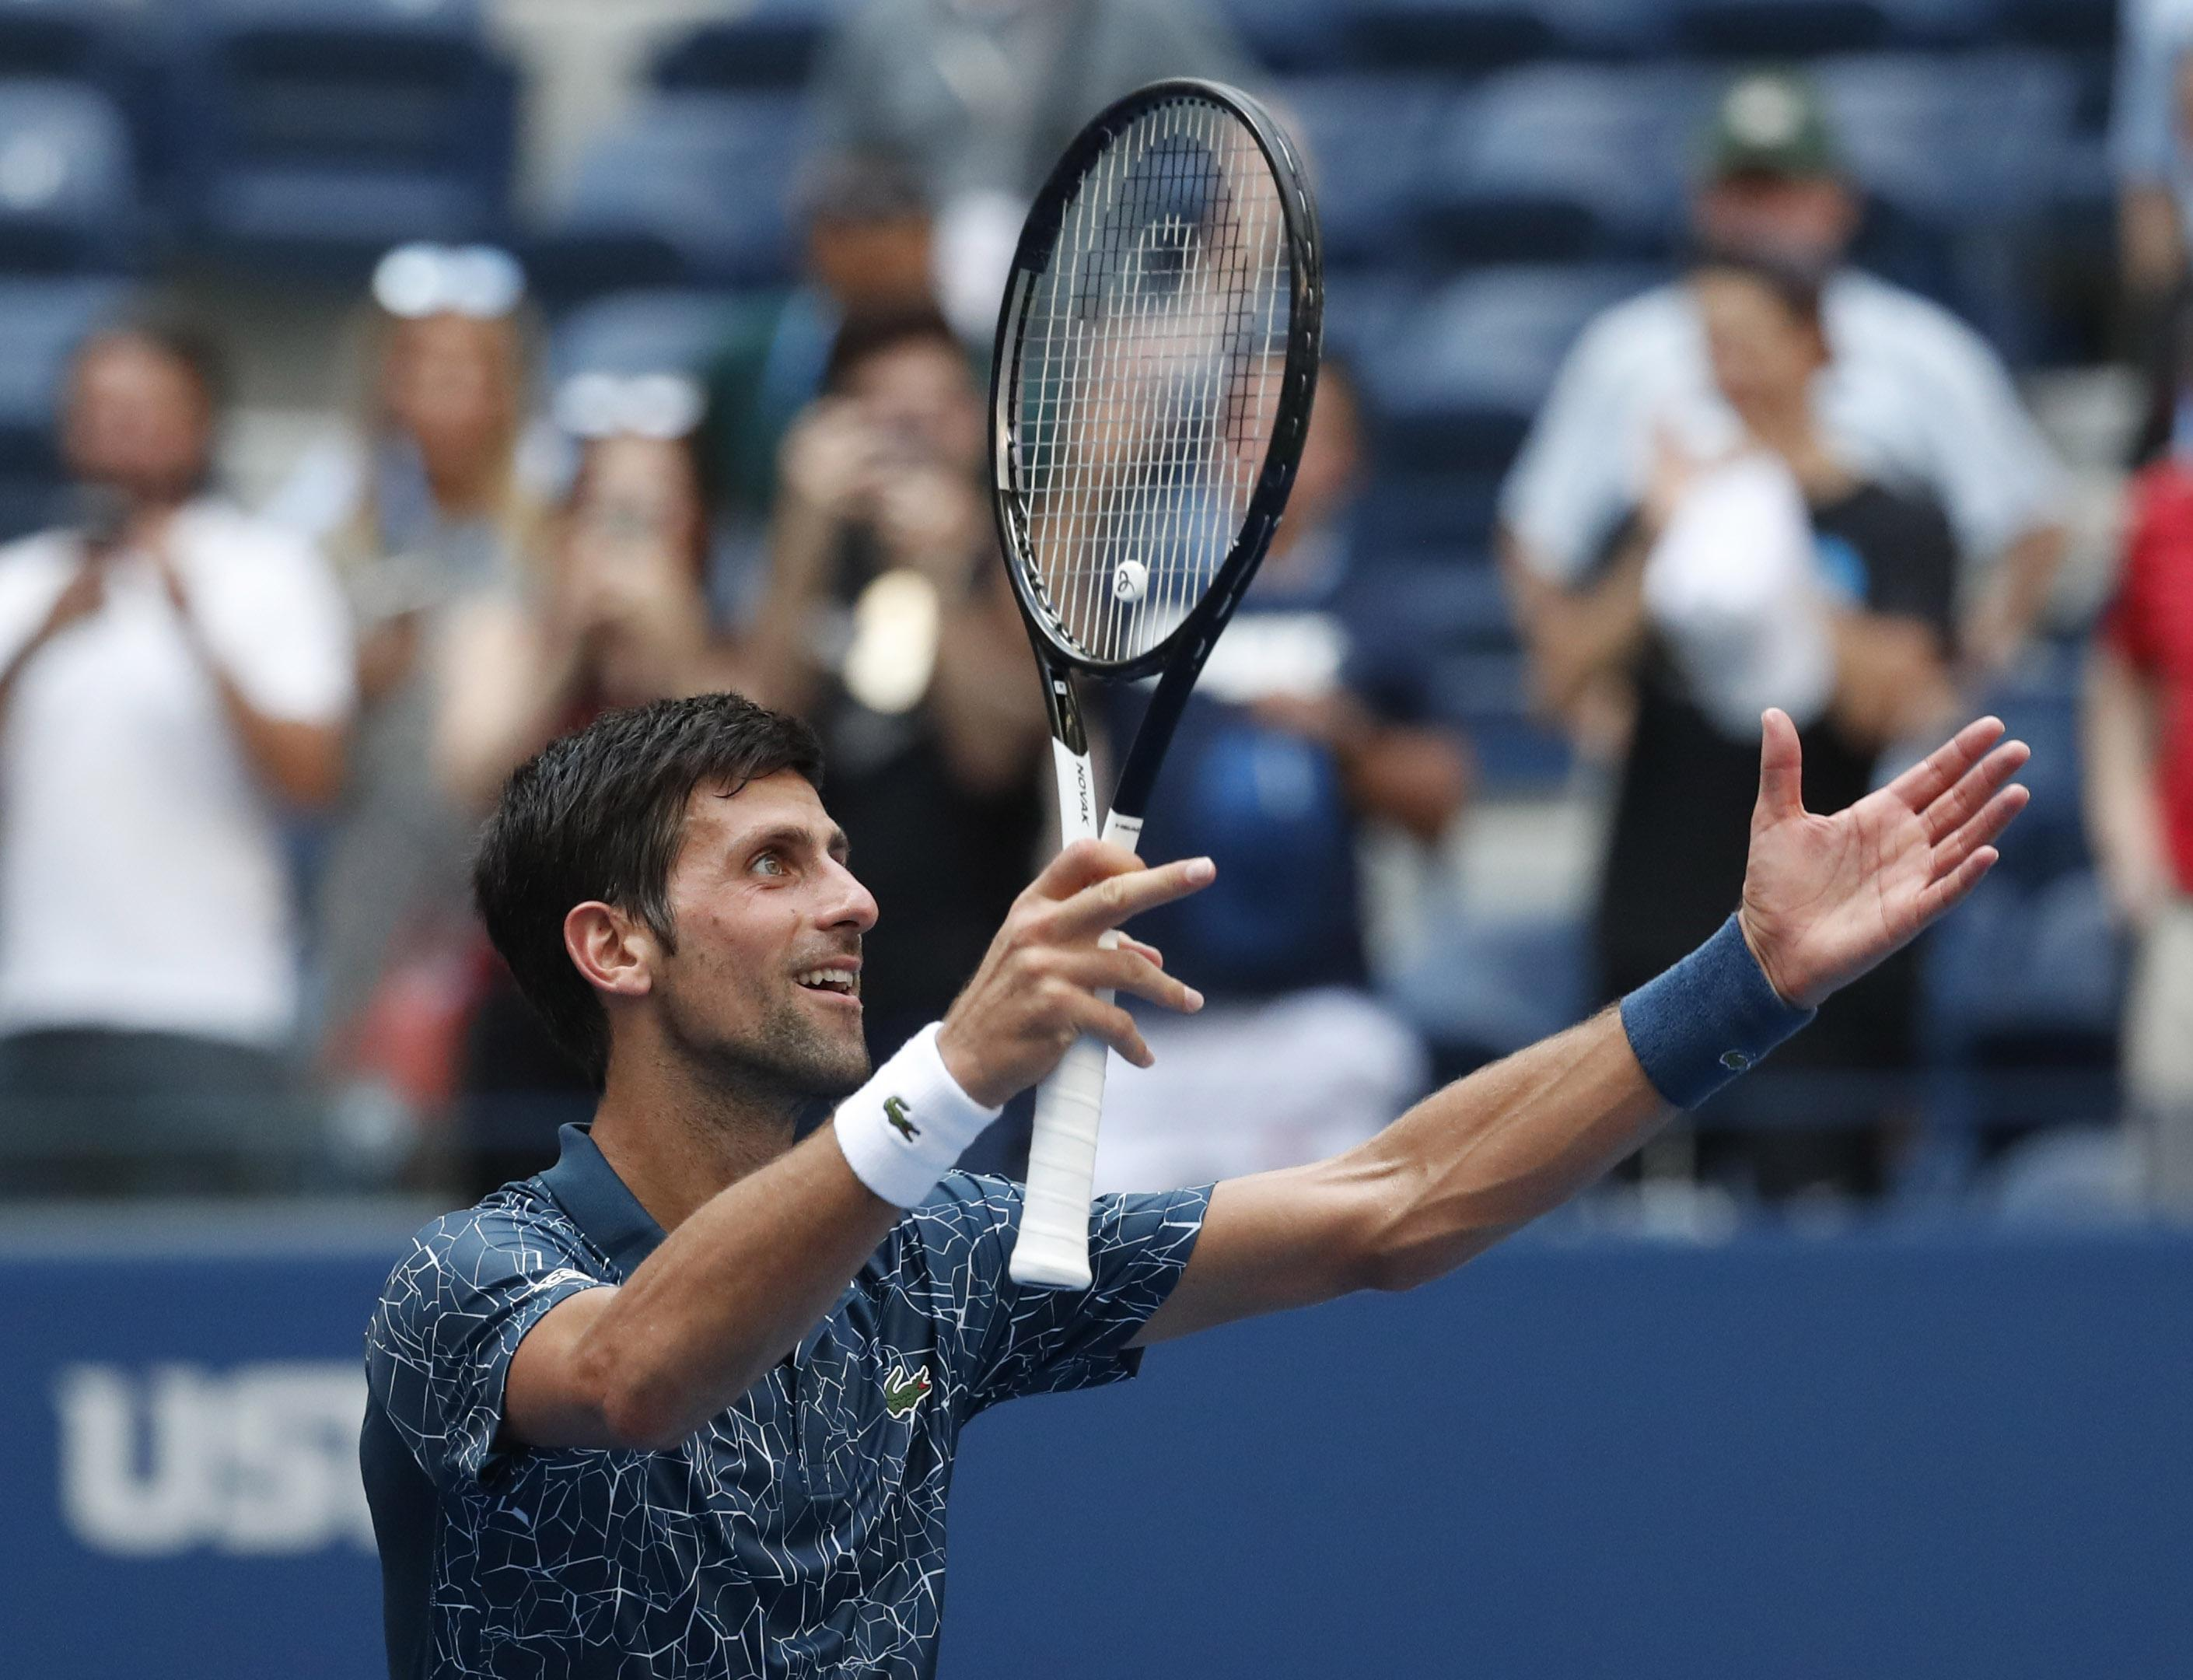 Novak Djokovic came through a tricky first-round match in New York